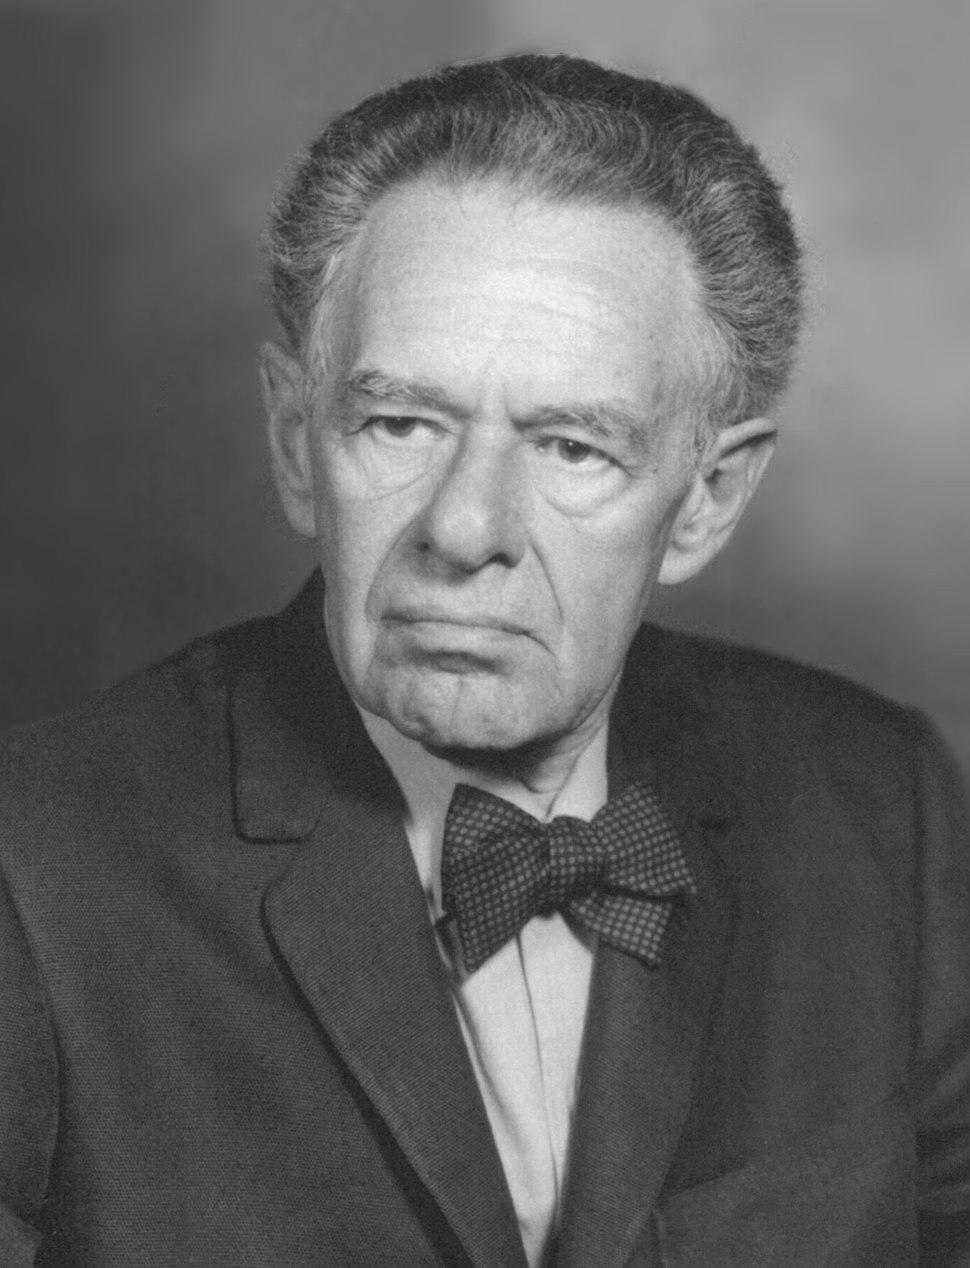 Portrait of Fritz Albert Lipmann (1899-1986), Biochemist (2551001689)